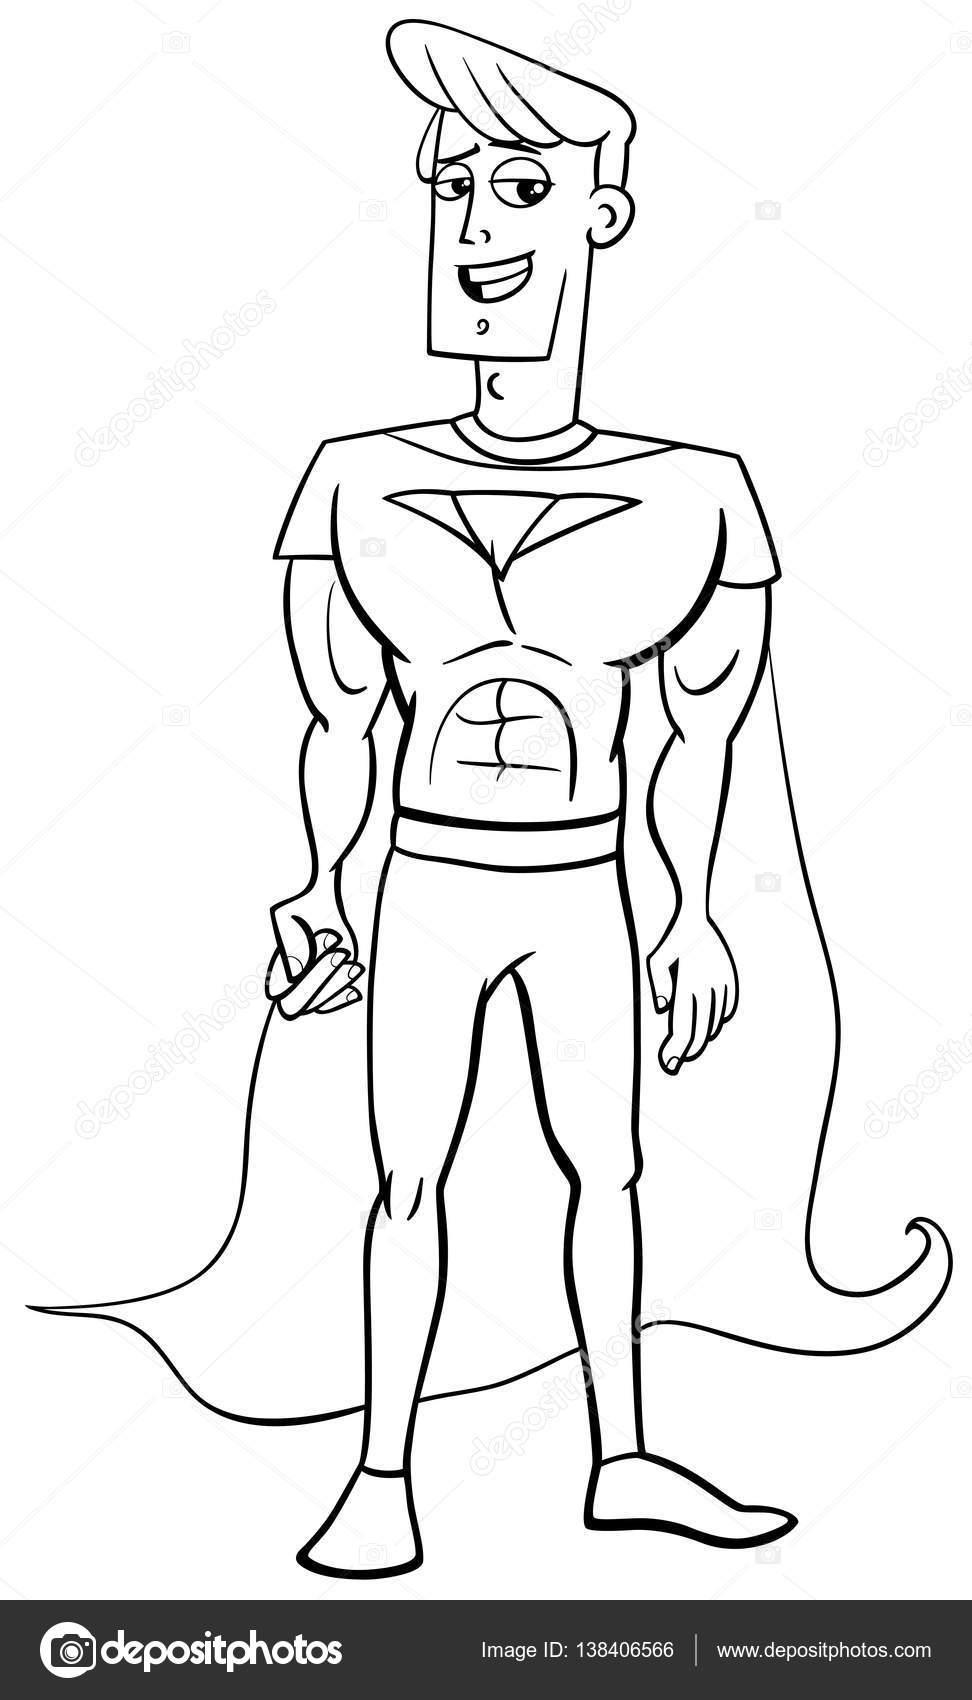 Malvorlagen Superhelden — Stockvektor © izakowski #138406566